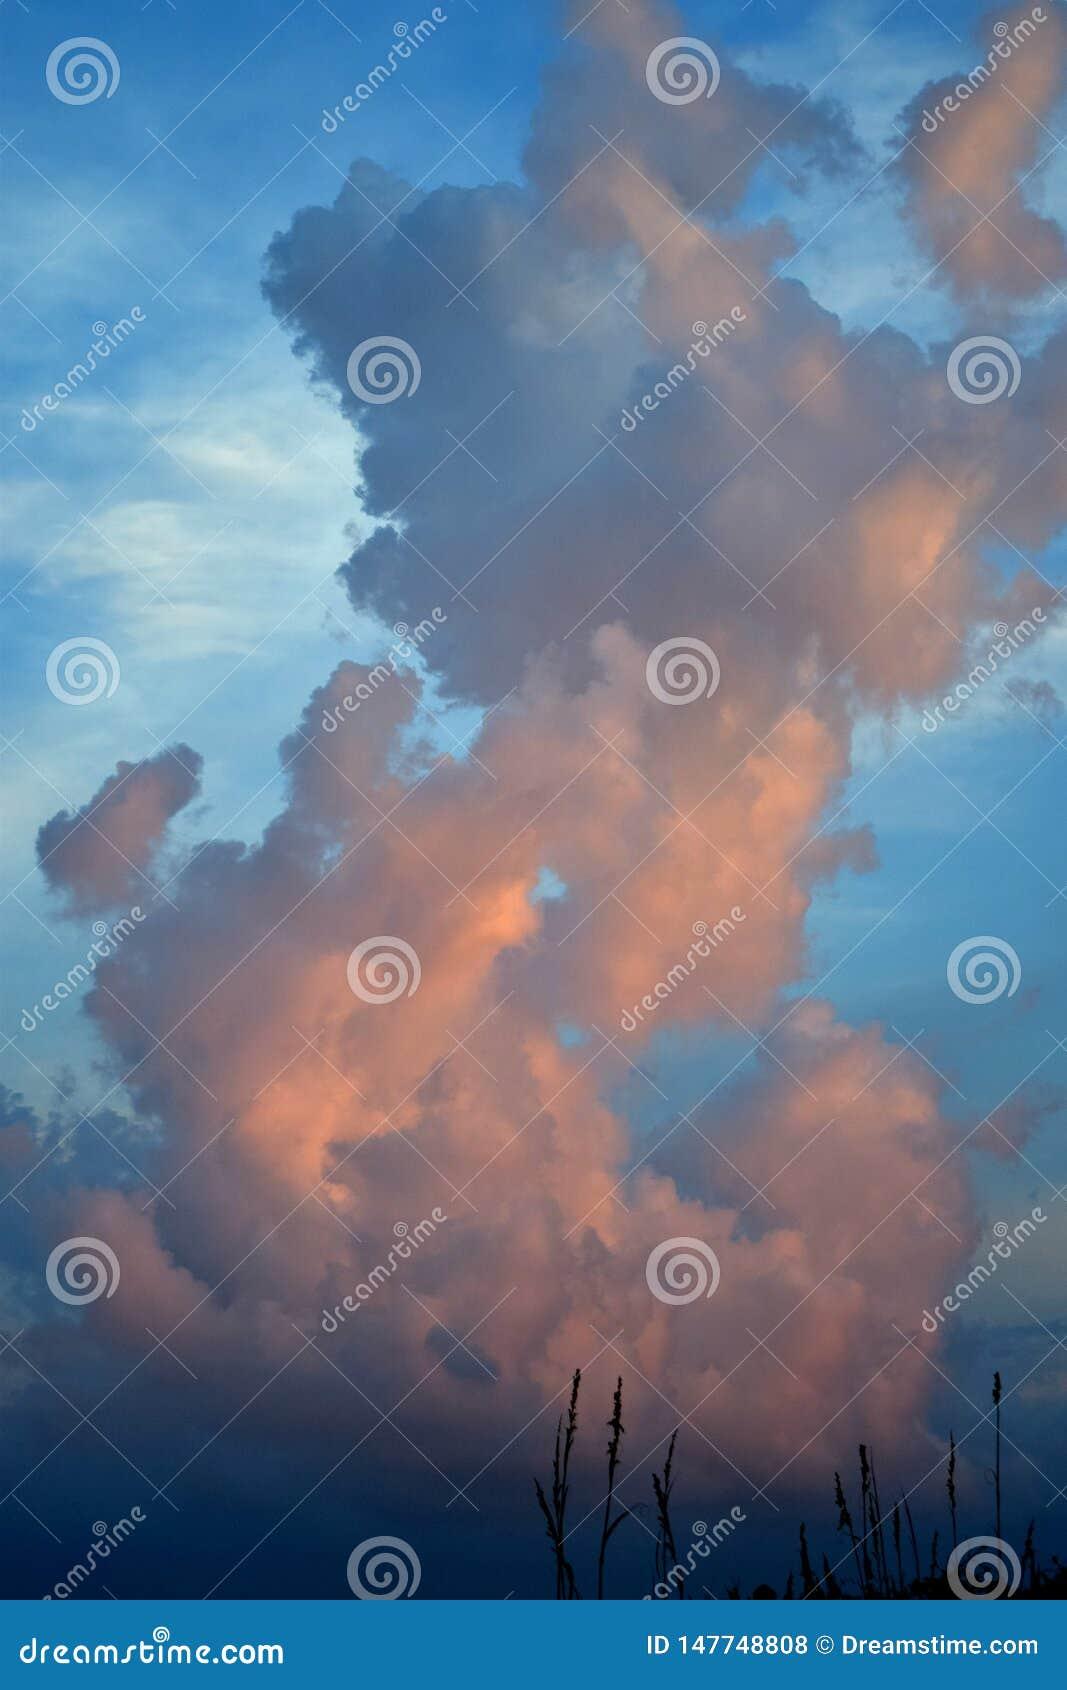 Fluffy cloud illuminated by the evening sun